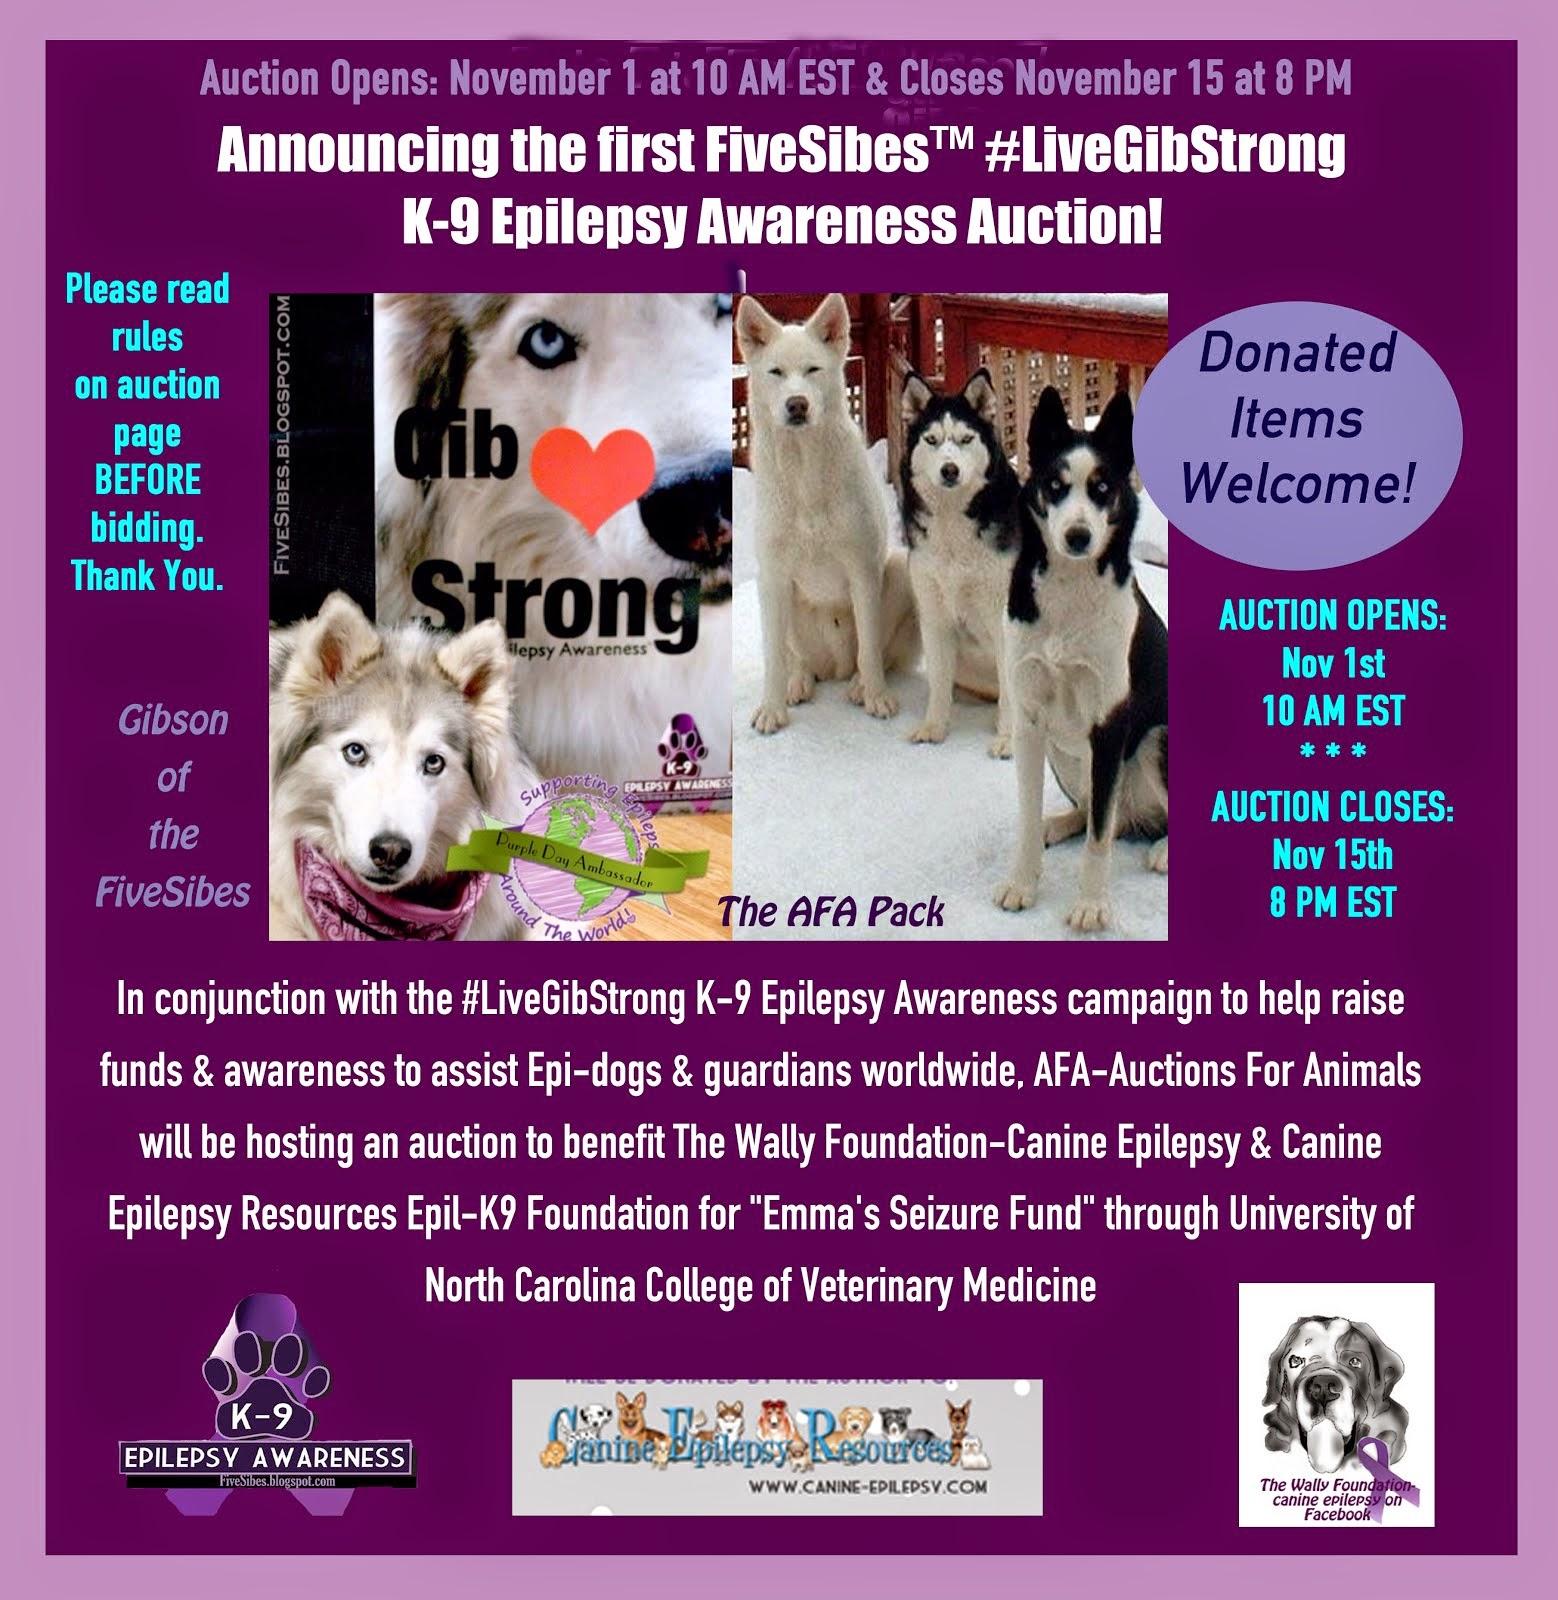 FiveSibes #LiveGibStrong K-9 Epilepsy Awareness Fundraiser